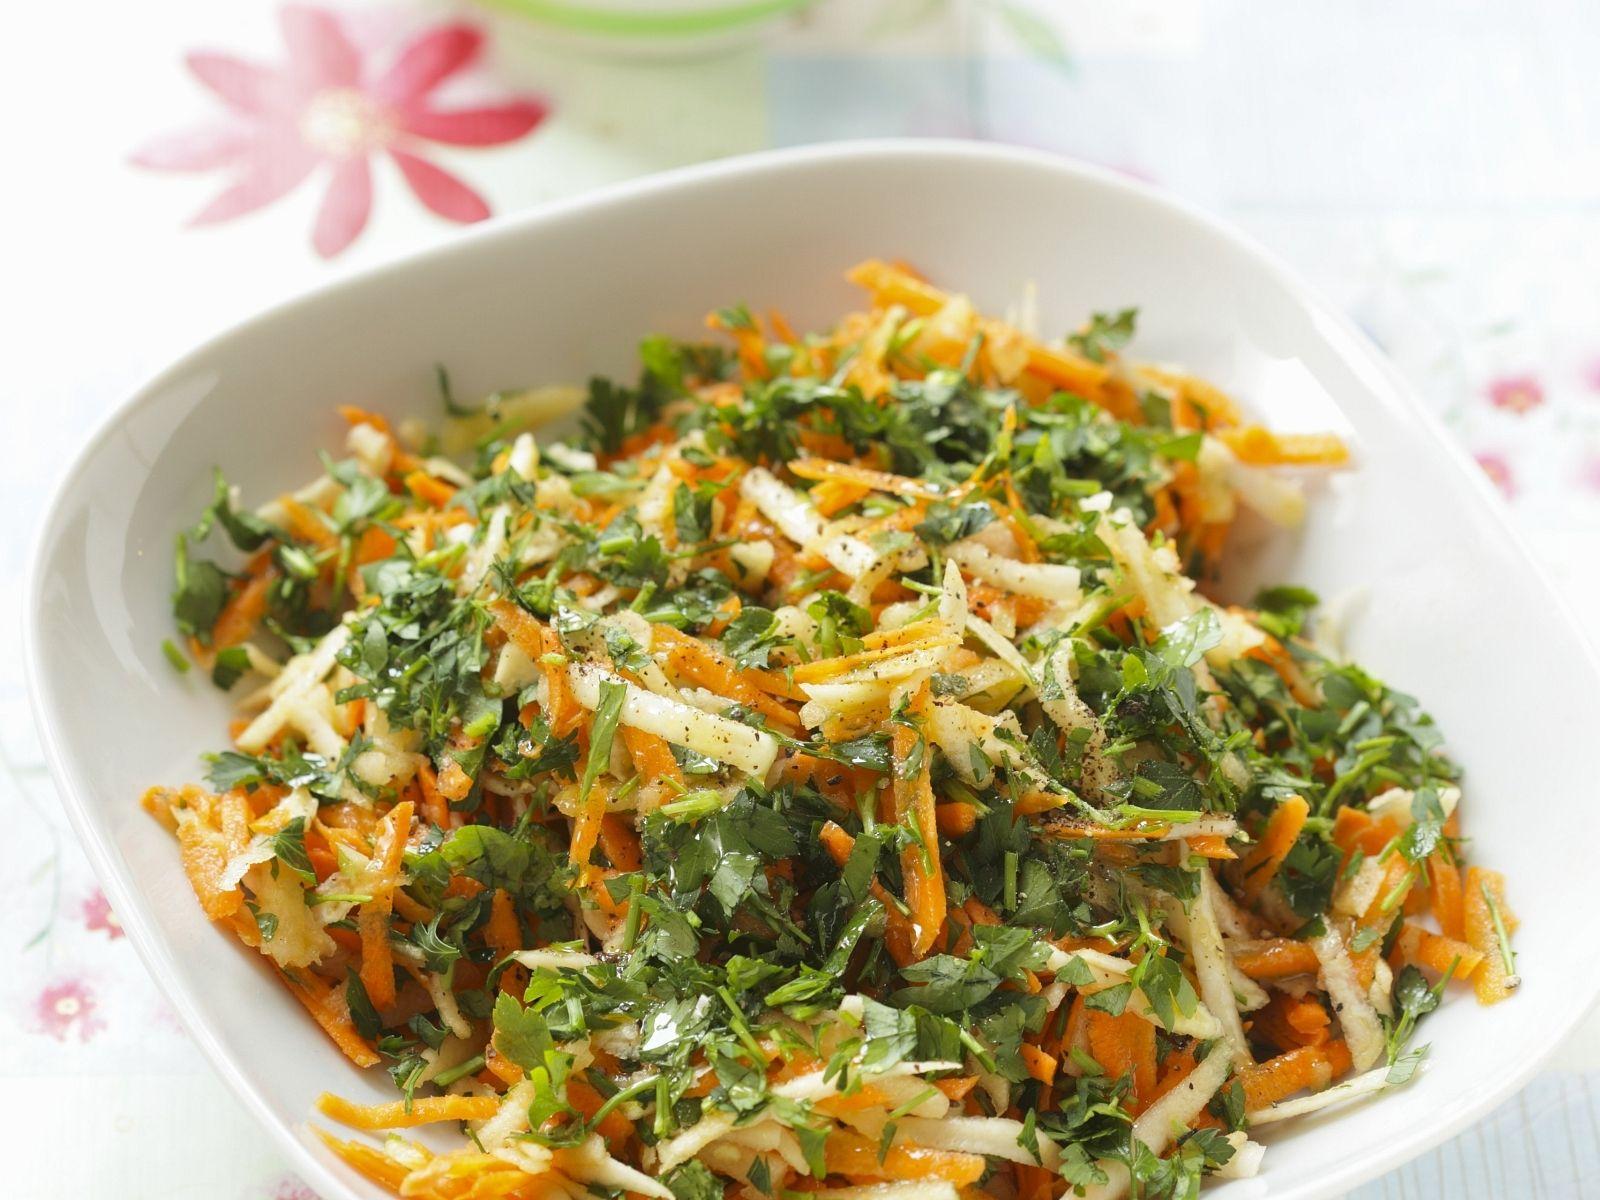 5afb8b2ccb8248c9d4492db9430fedad - Rezepte Salat